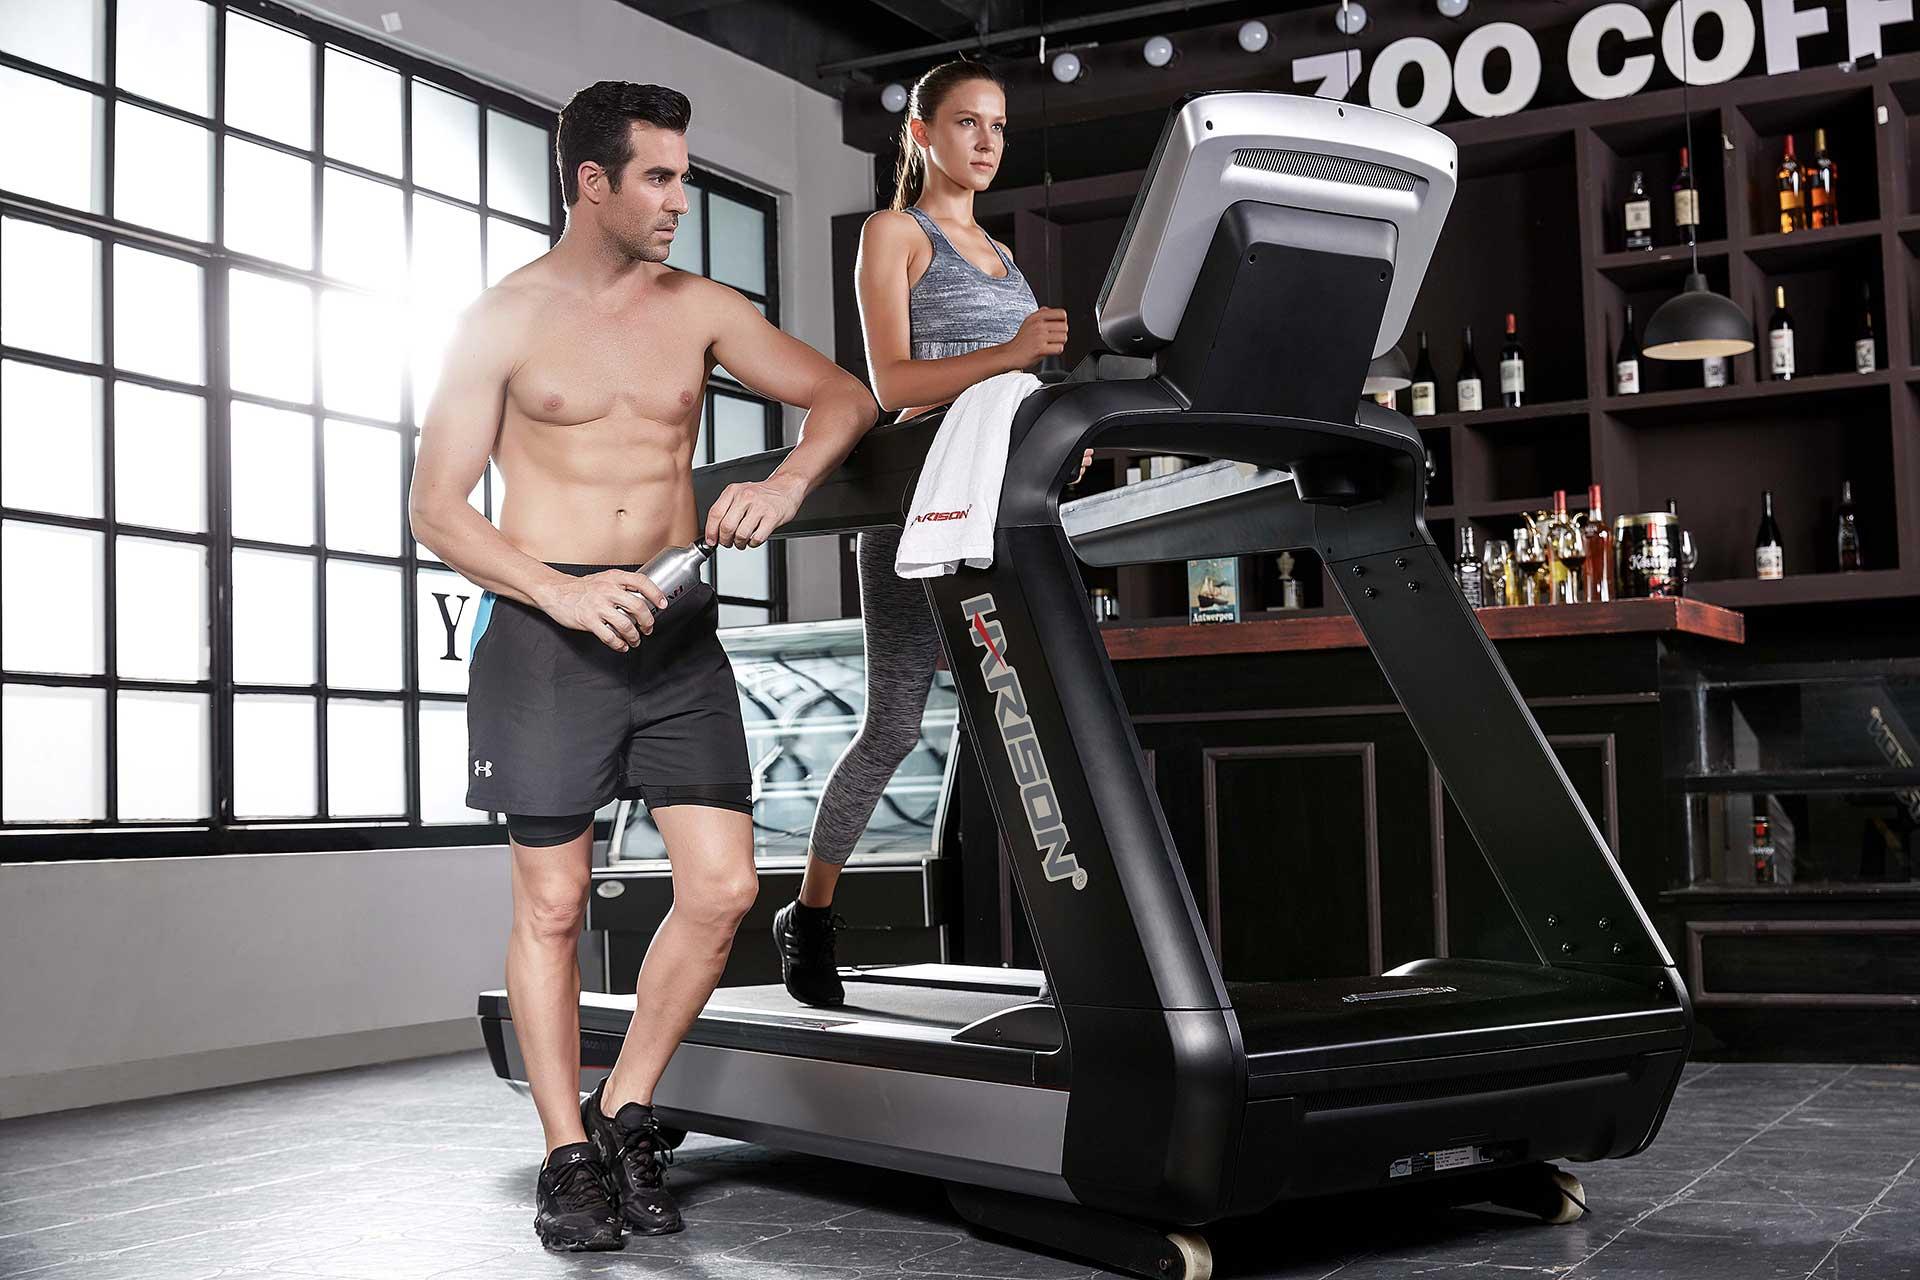 HARISONFITNESS treadmill exercise bike elliptical rowing machine recumbent bike